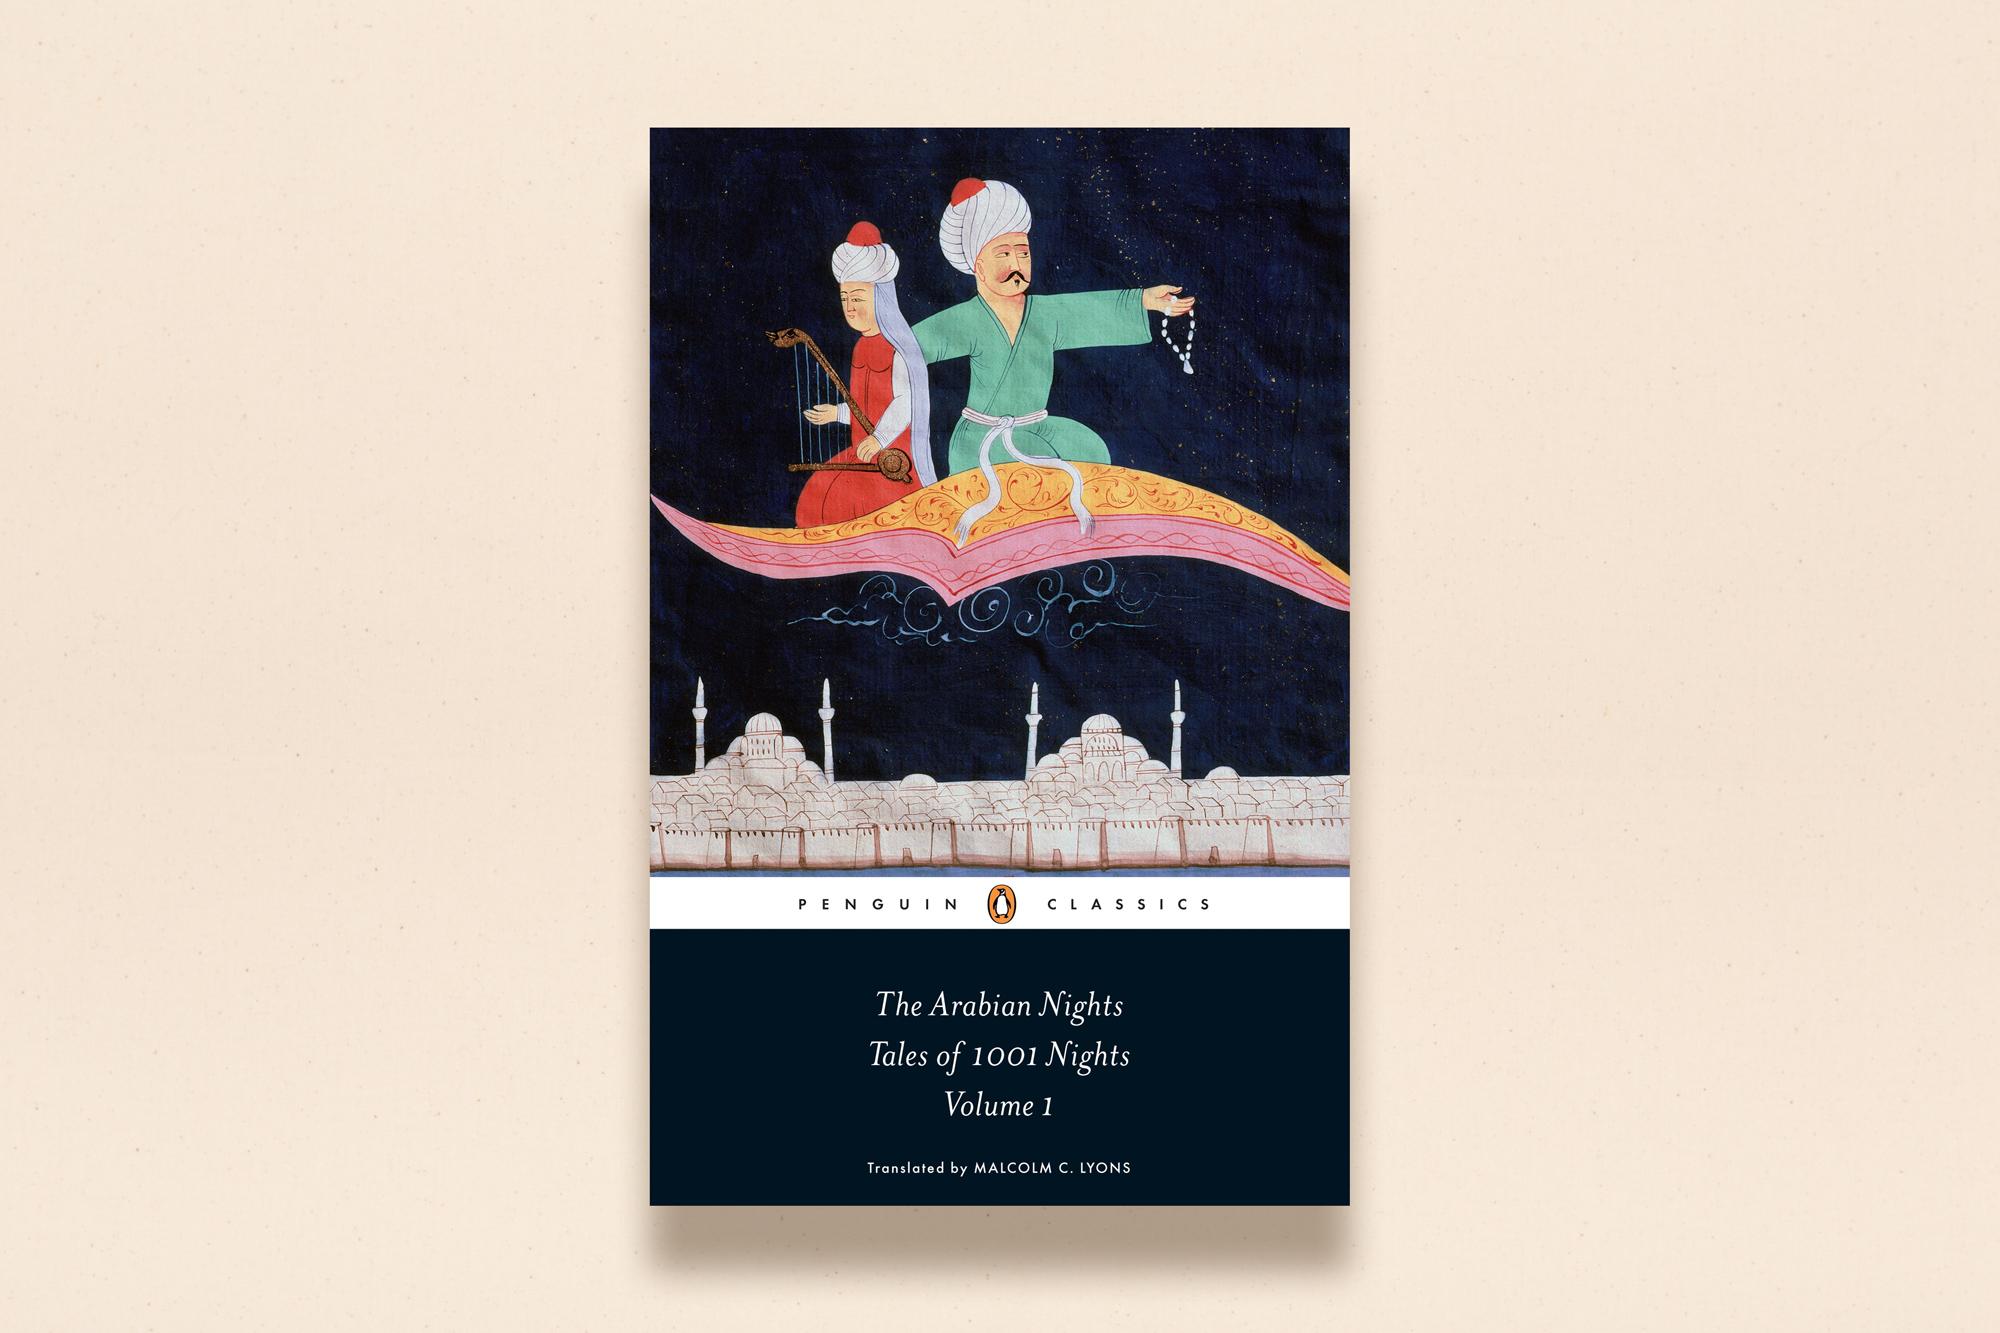 Arabian Nights Vol.1